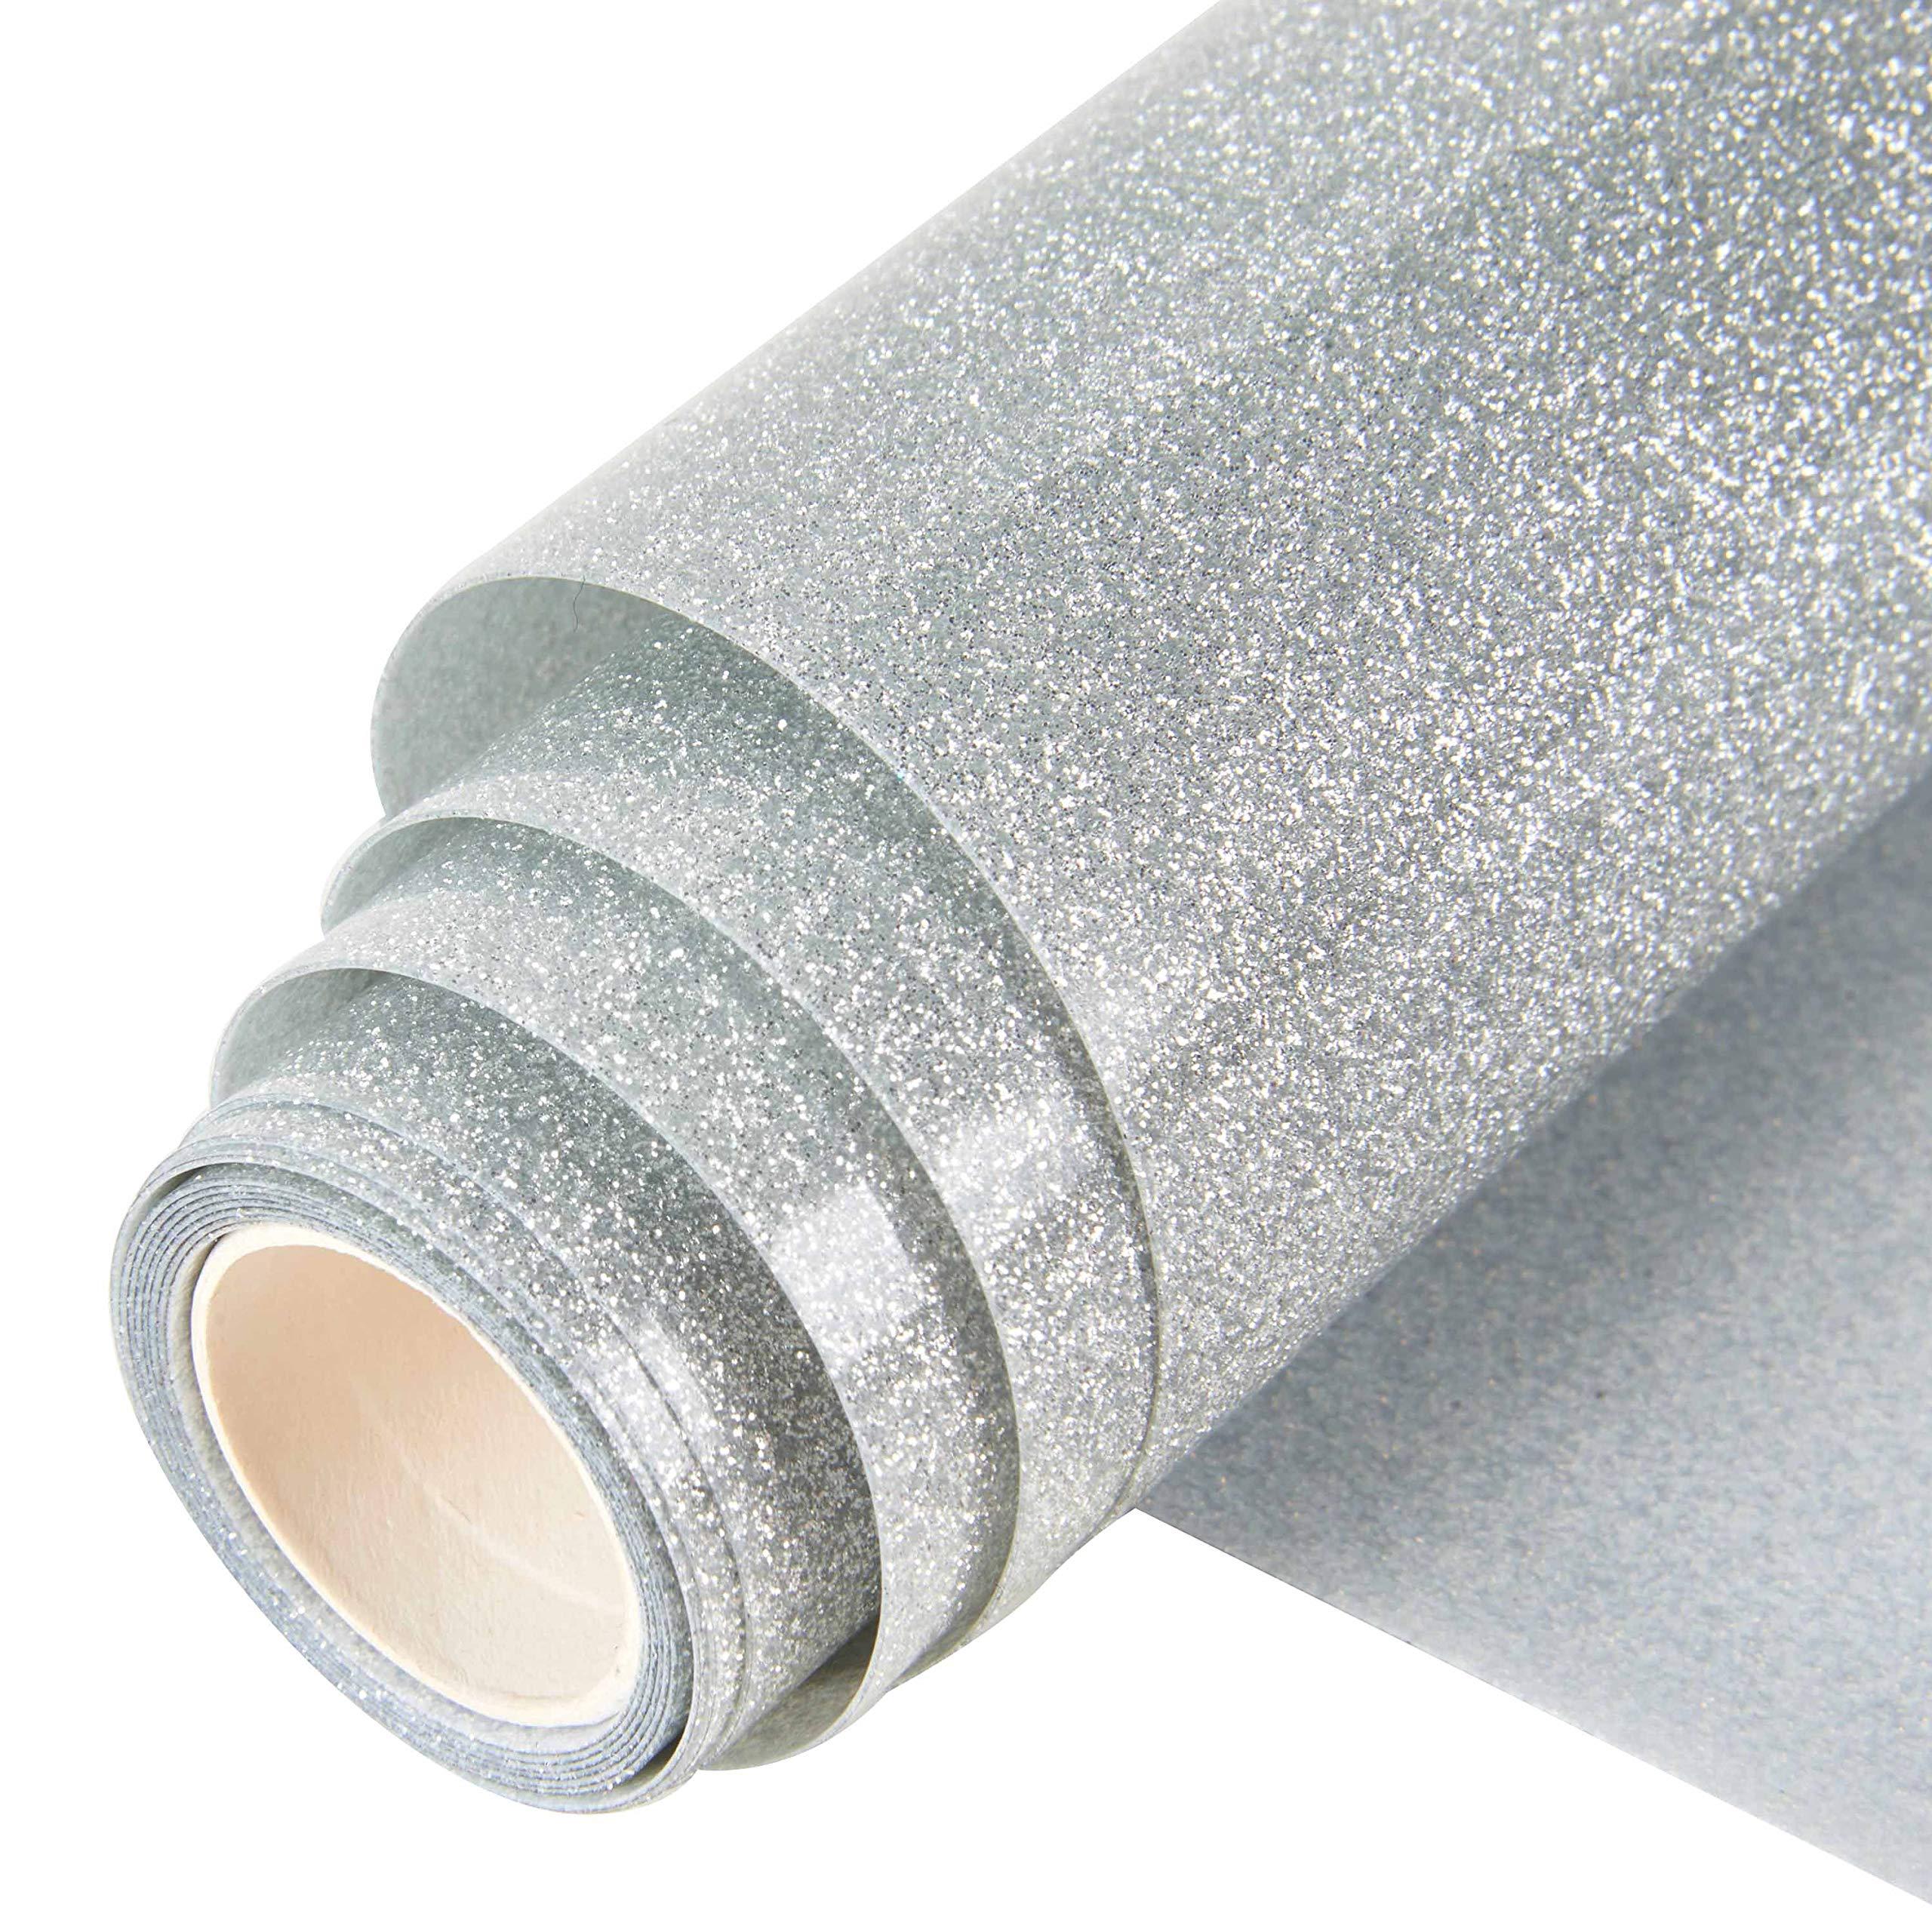 Topmail PVC Transferencia de Calor Vinilo Máquina de Prensa de Calor Corte Plotter Cortador Camiseta Papel de Lámina DIY 25 x 160 cm(Plata): Amazon.es: Oficina y papelería